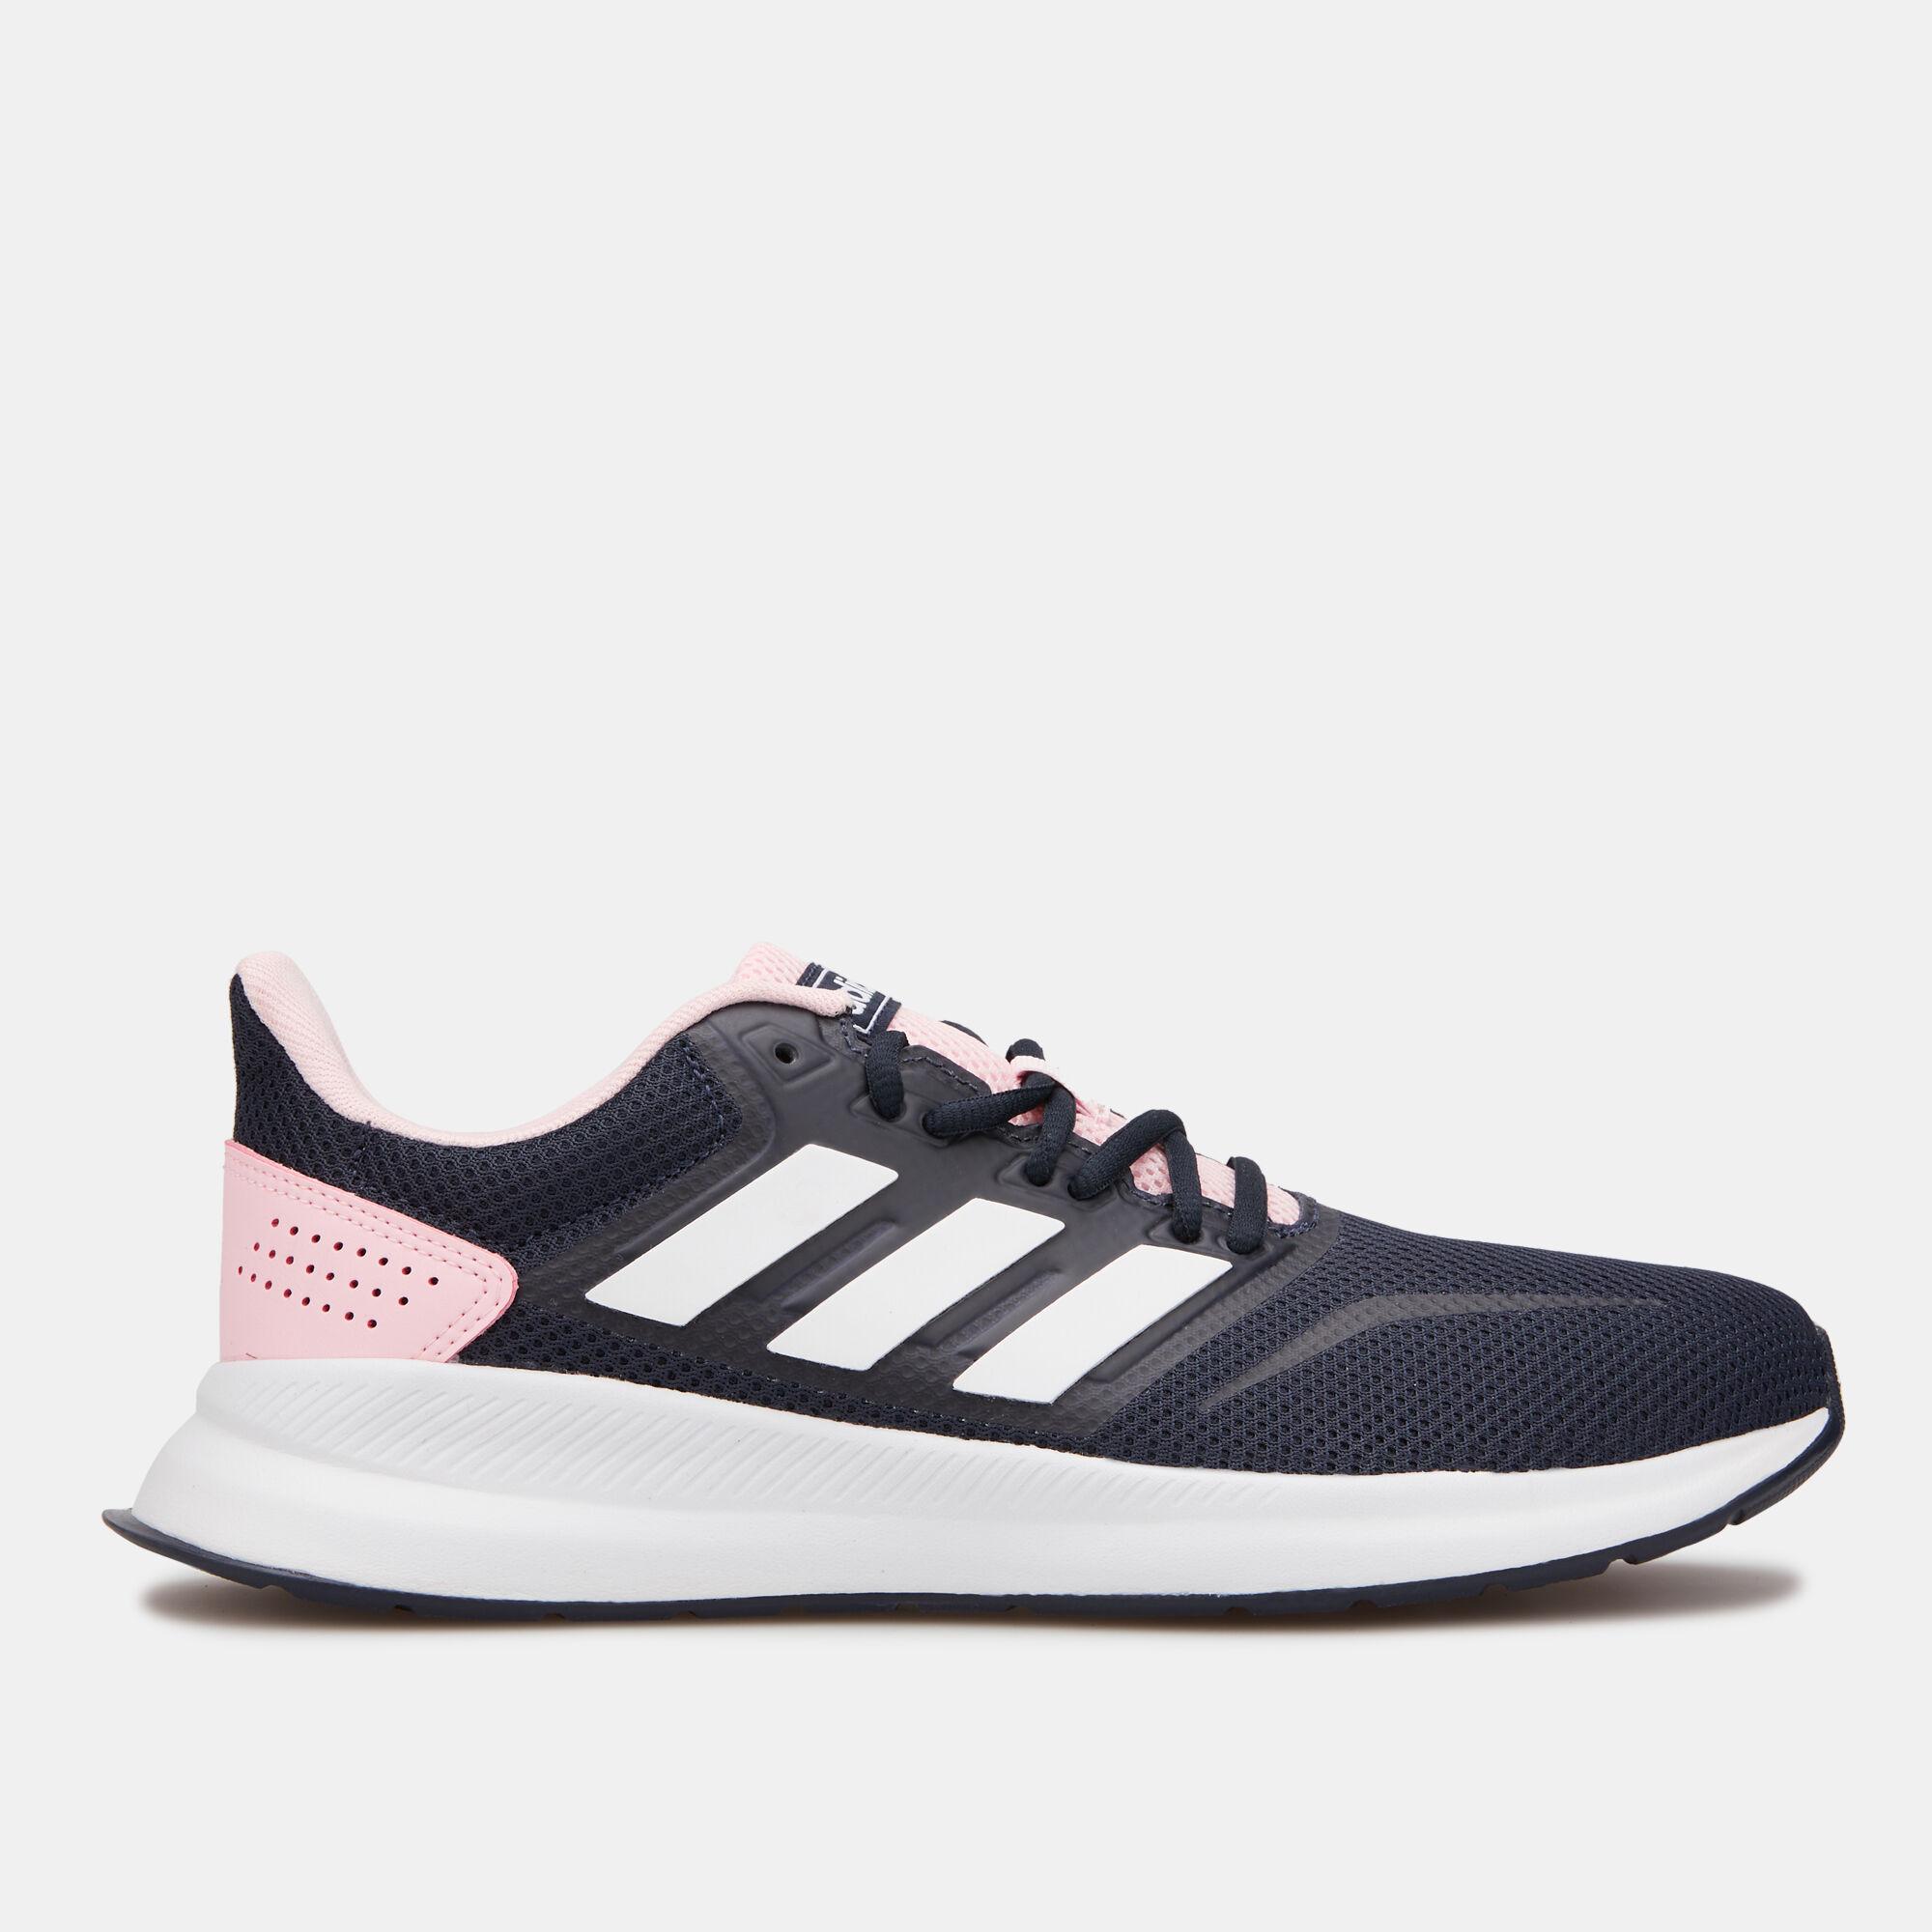 Buy adidas Women's Runfalcon Shoe in